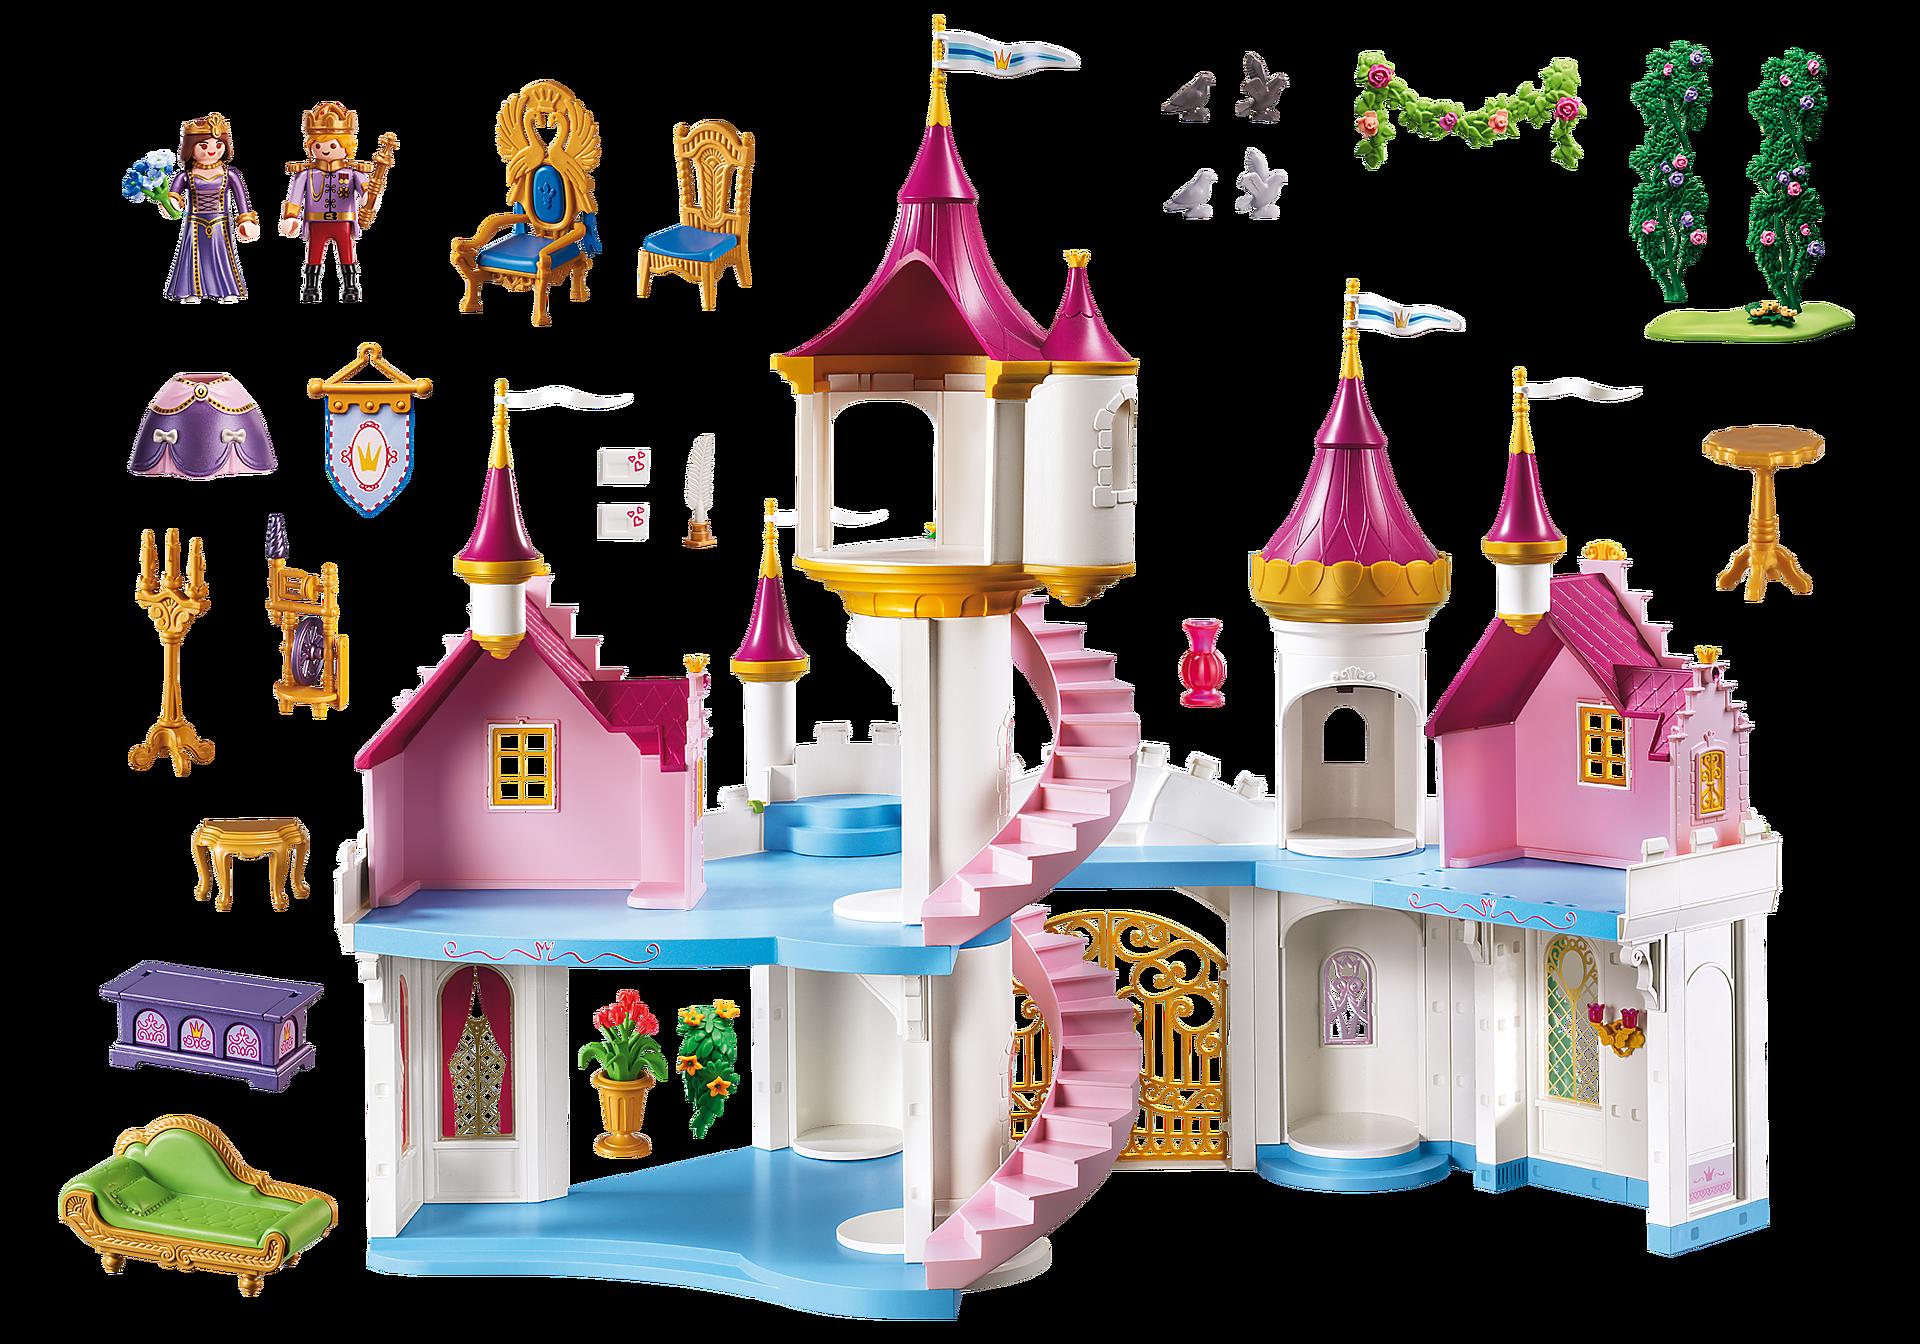 http://media.playmobil.com/i/playmobil/6848_product_box_back/Prinzessinnenschloss